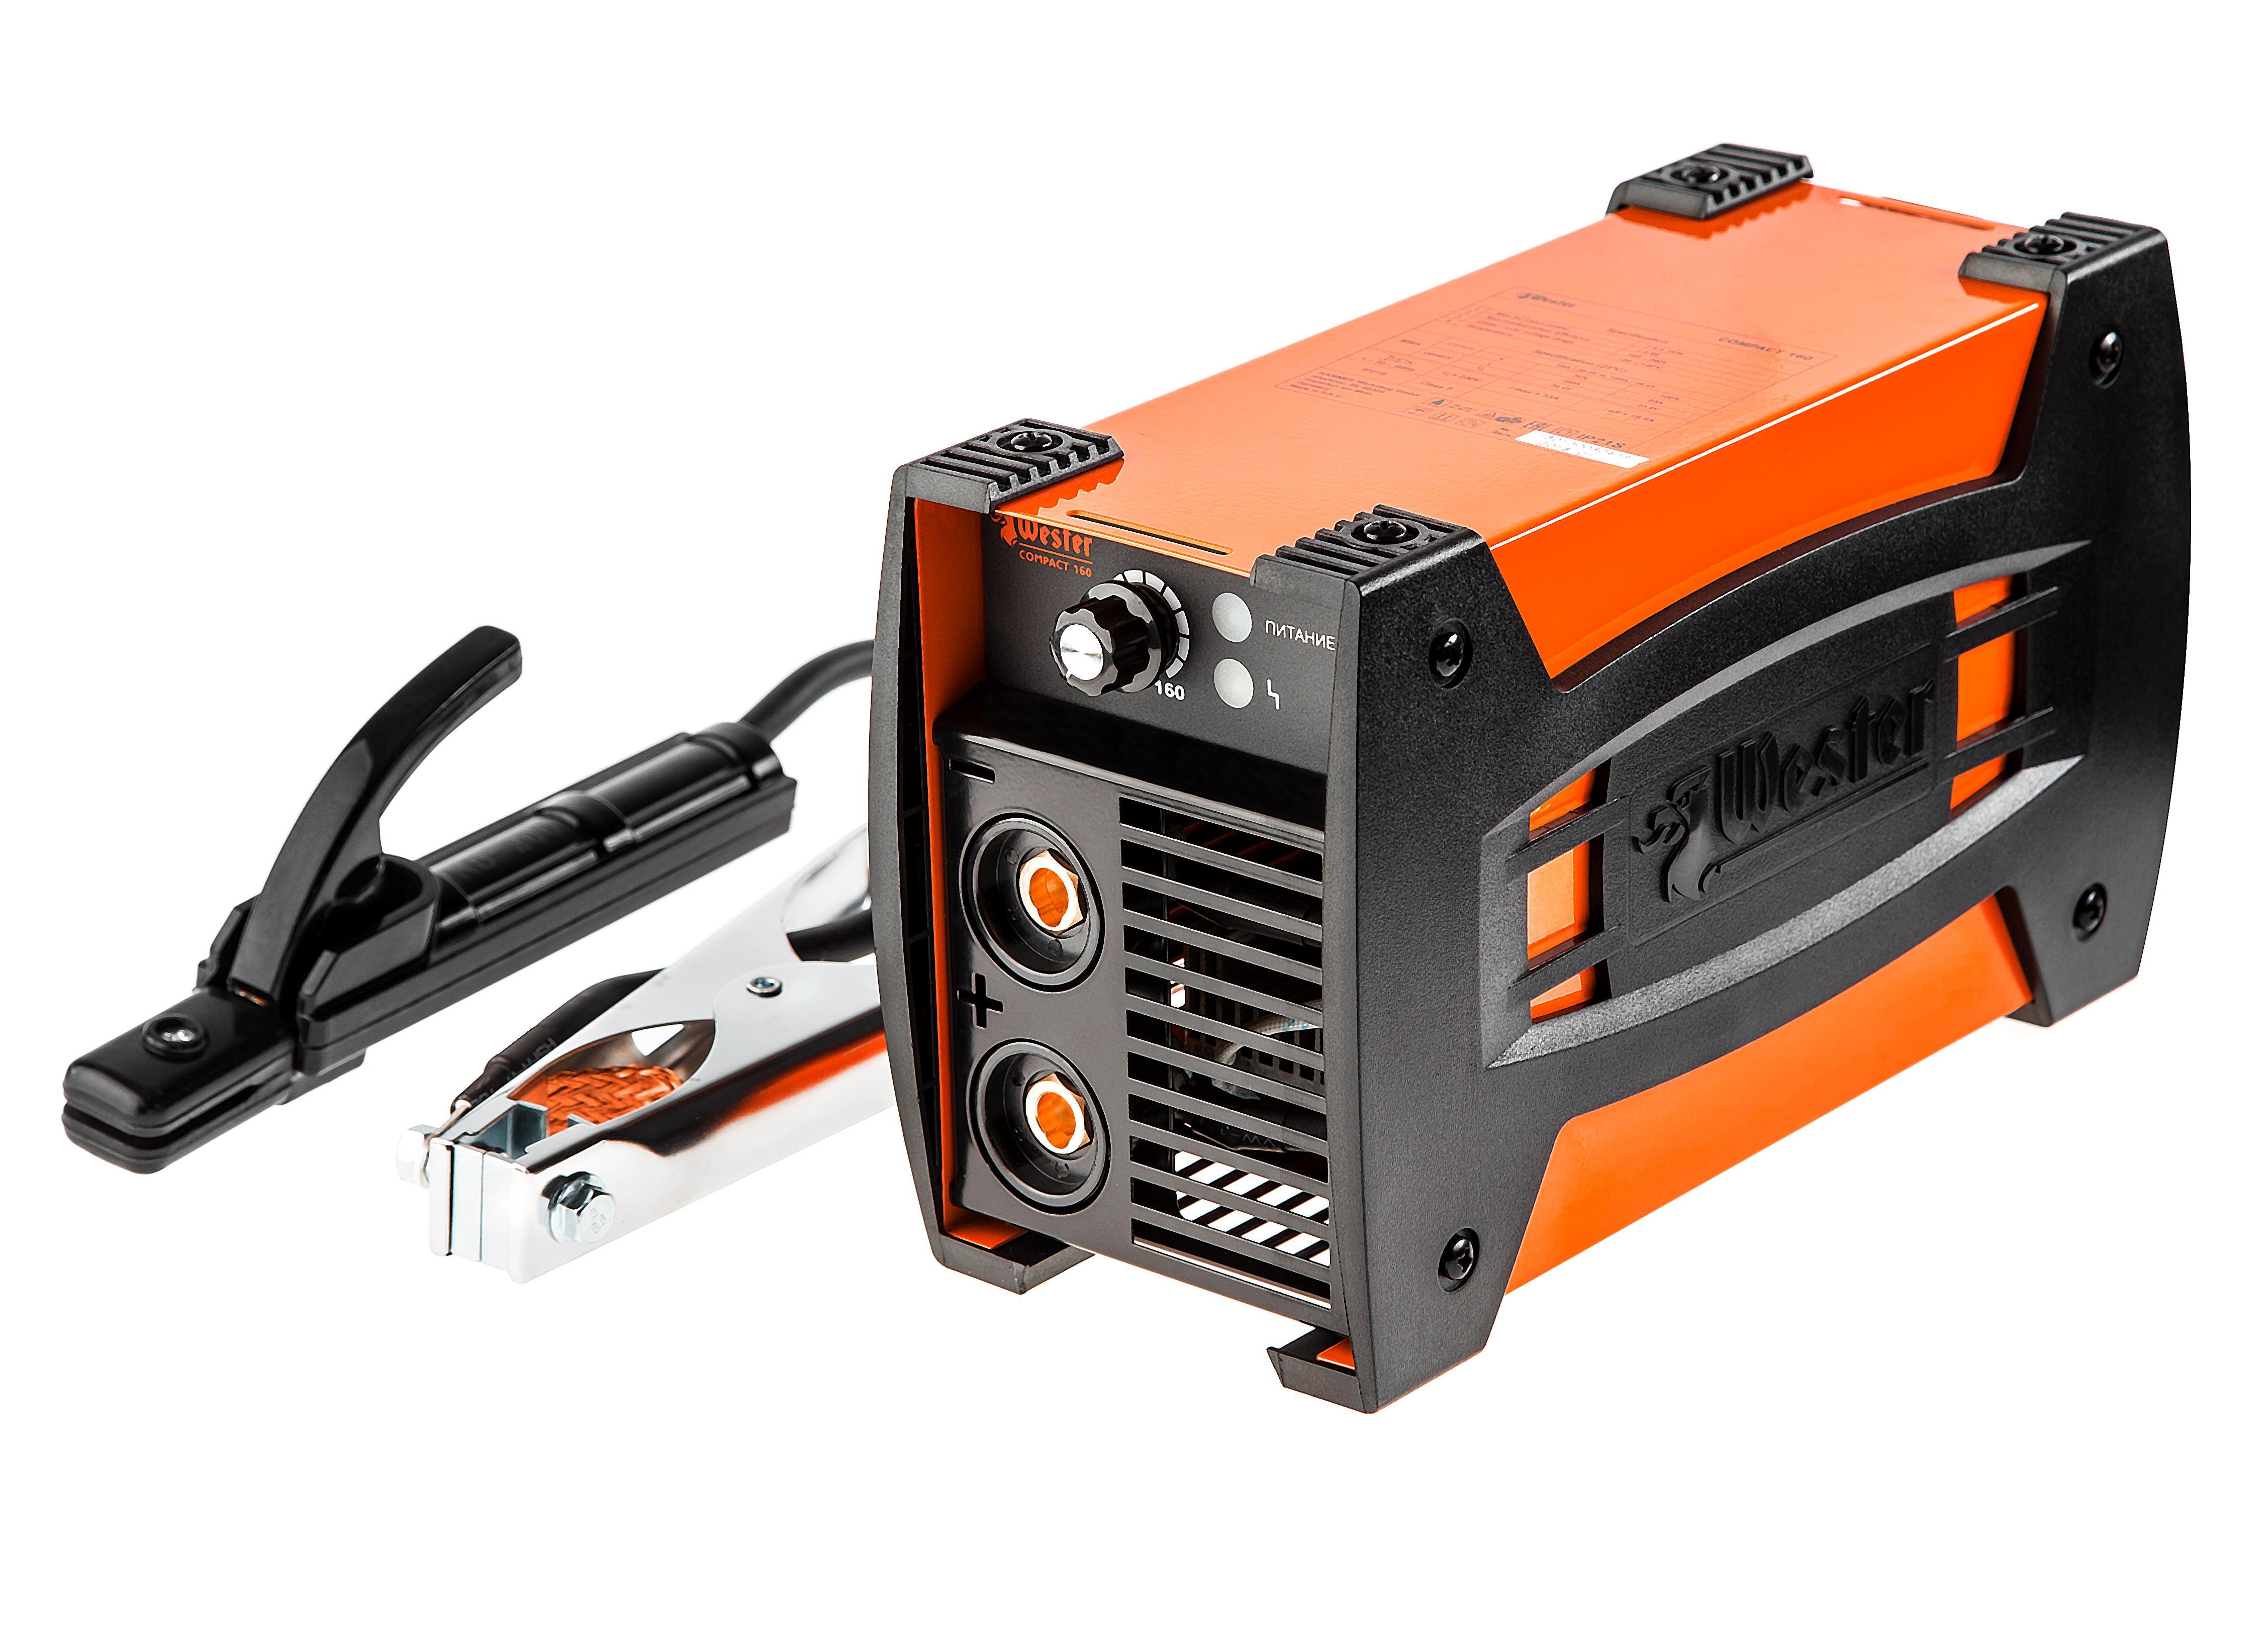 Сварочный аппарат Wester Compact 160 сварочный аппарат инверторный wester mma vrd 160